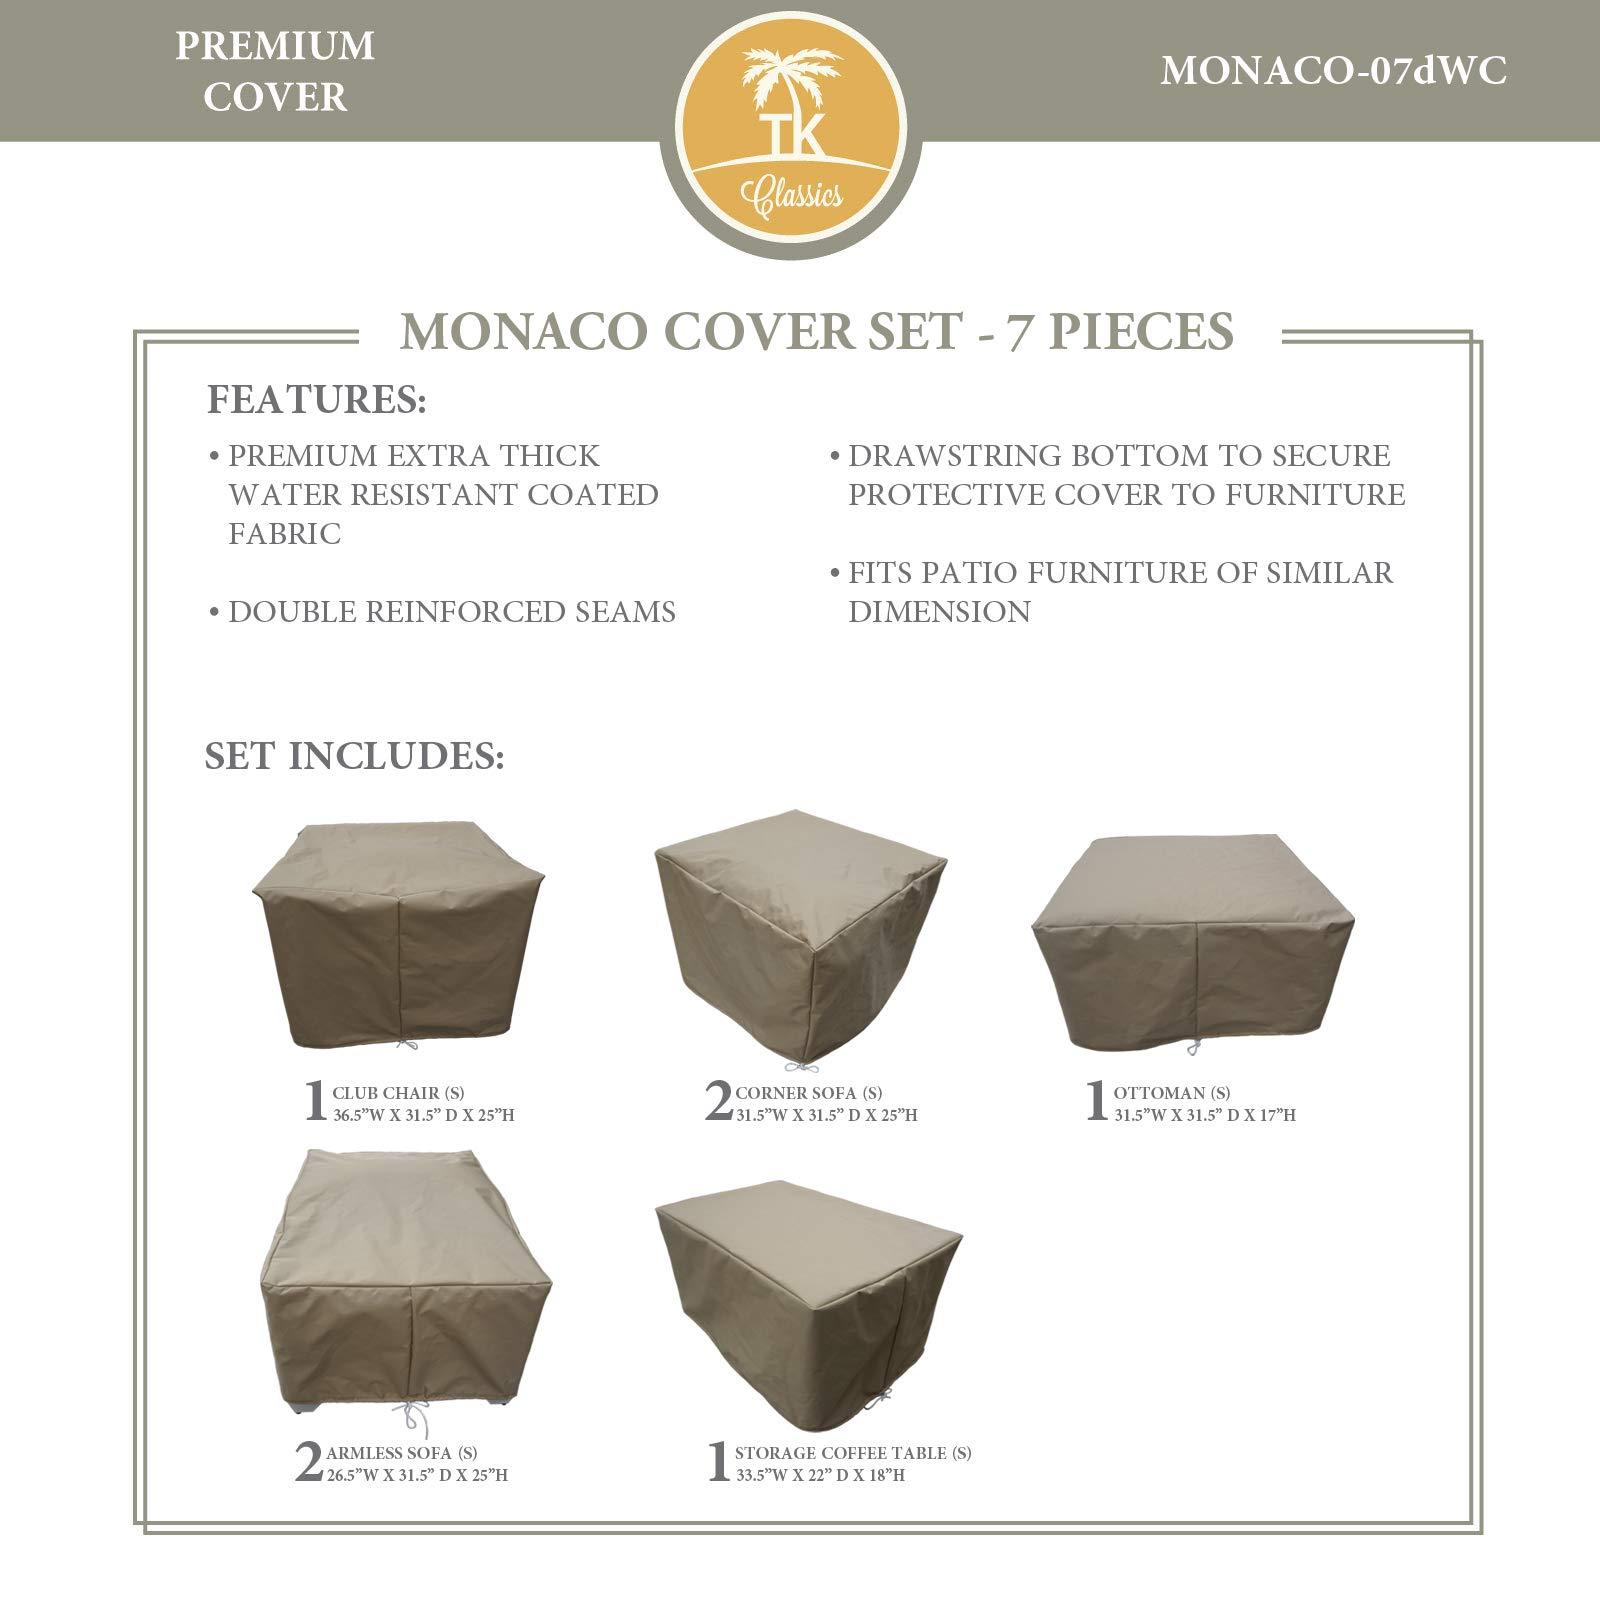 TK Classics MONACO-07dWC Covers Patio Furniture, Beige